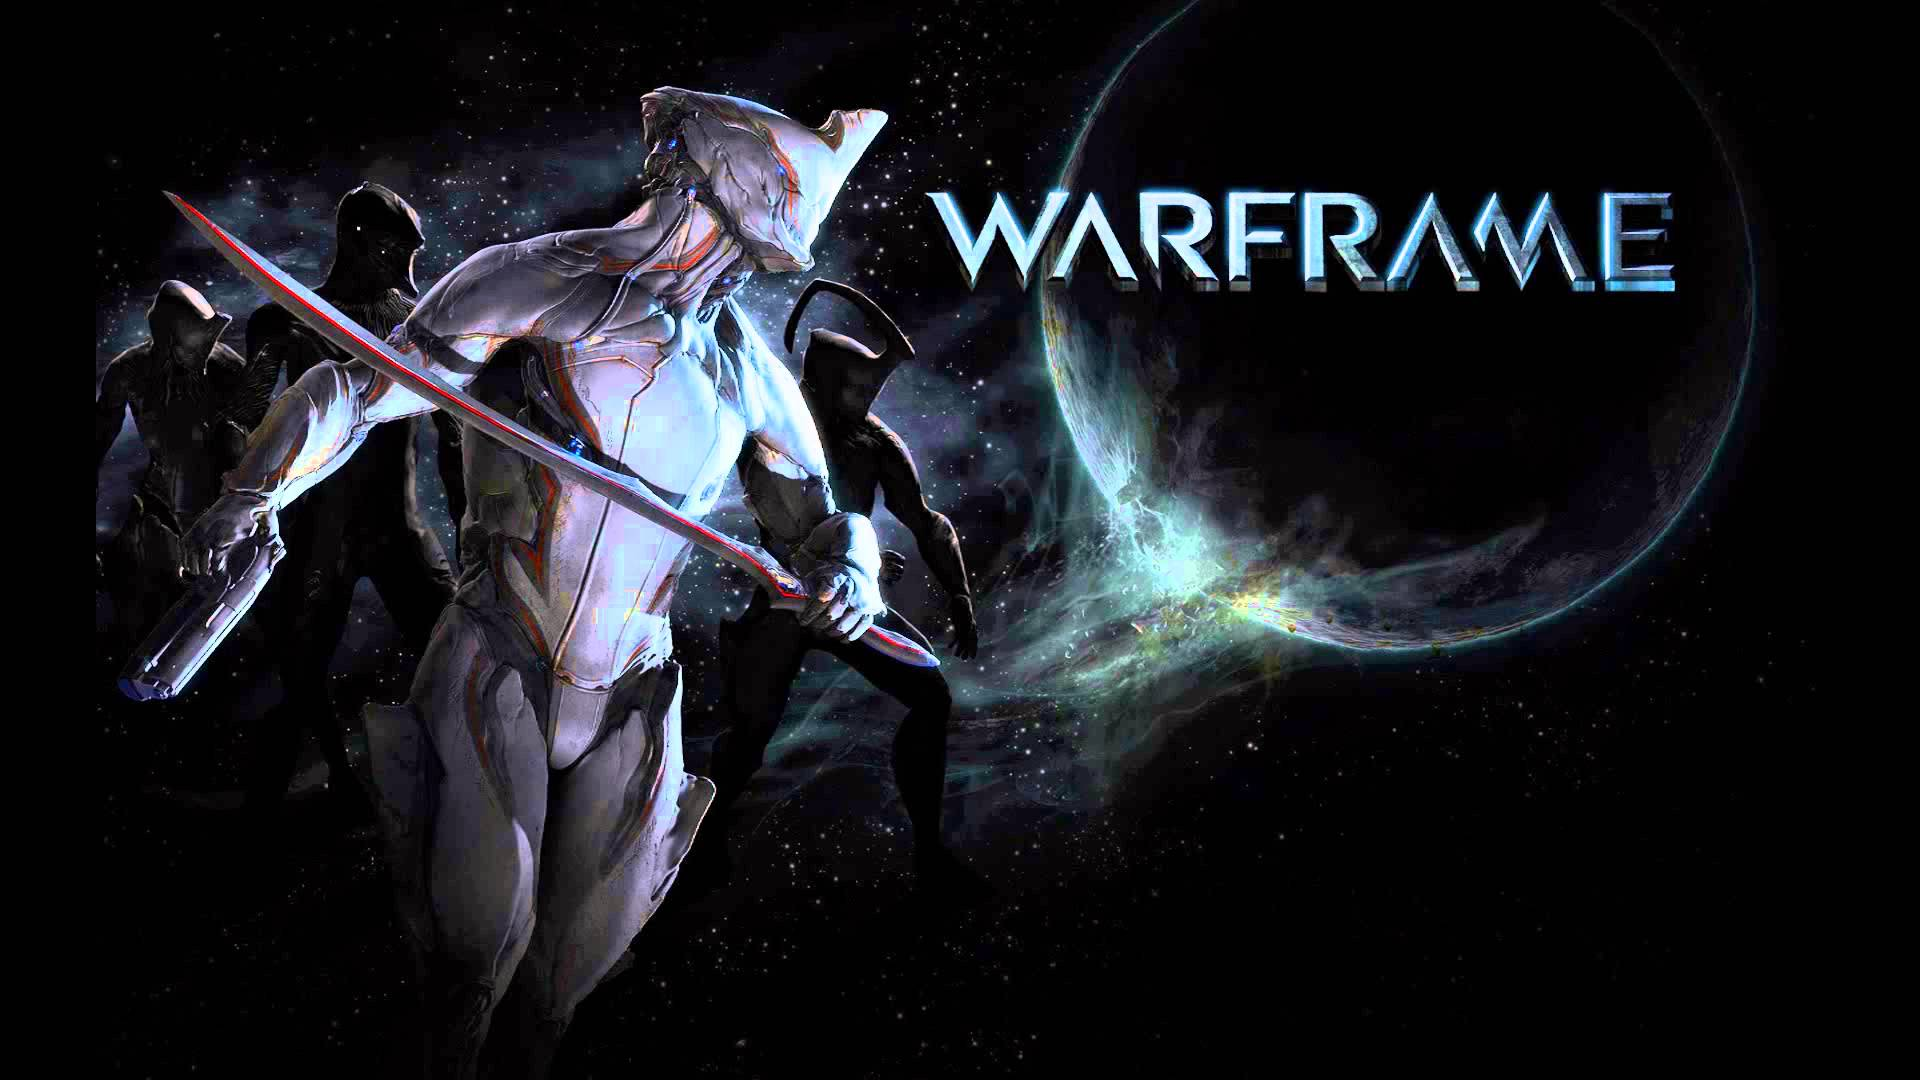 Warframe Acquired By Perfect World (Well...Kind of) ÃÃâÃà MMOBomb.com